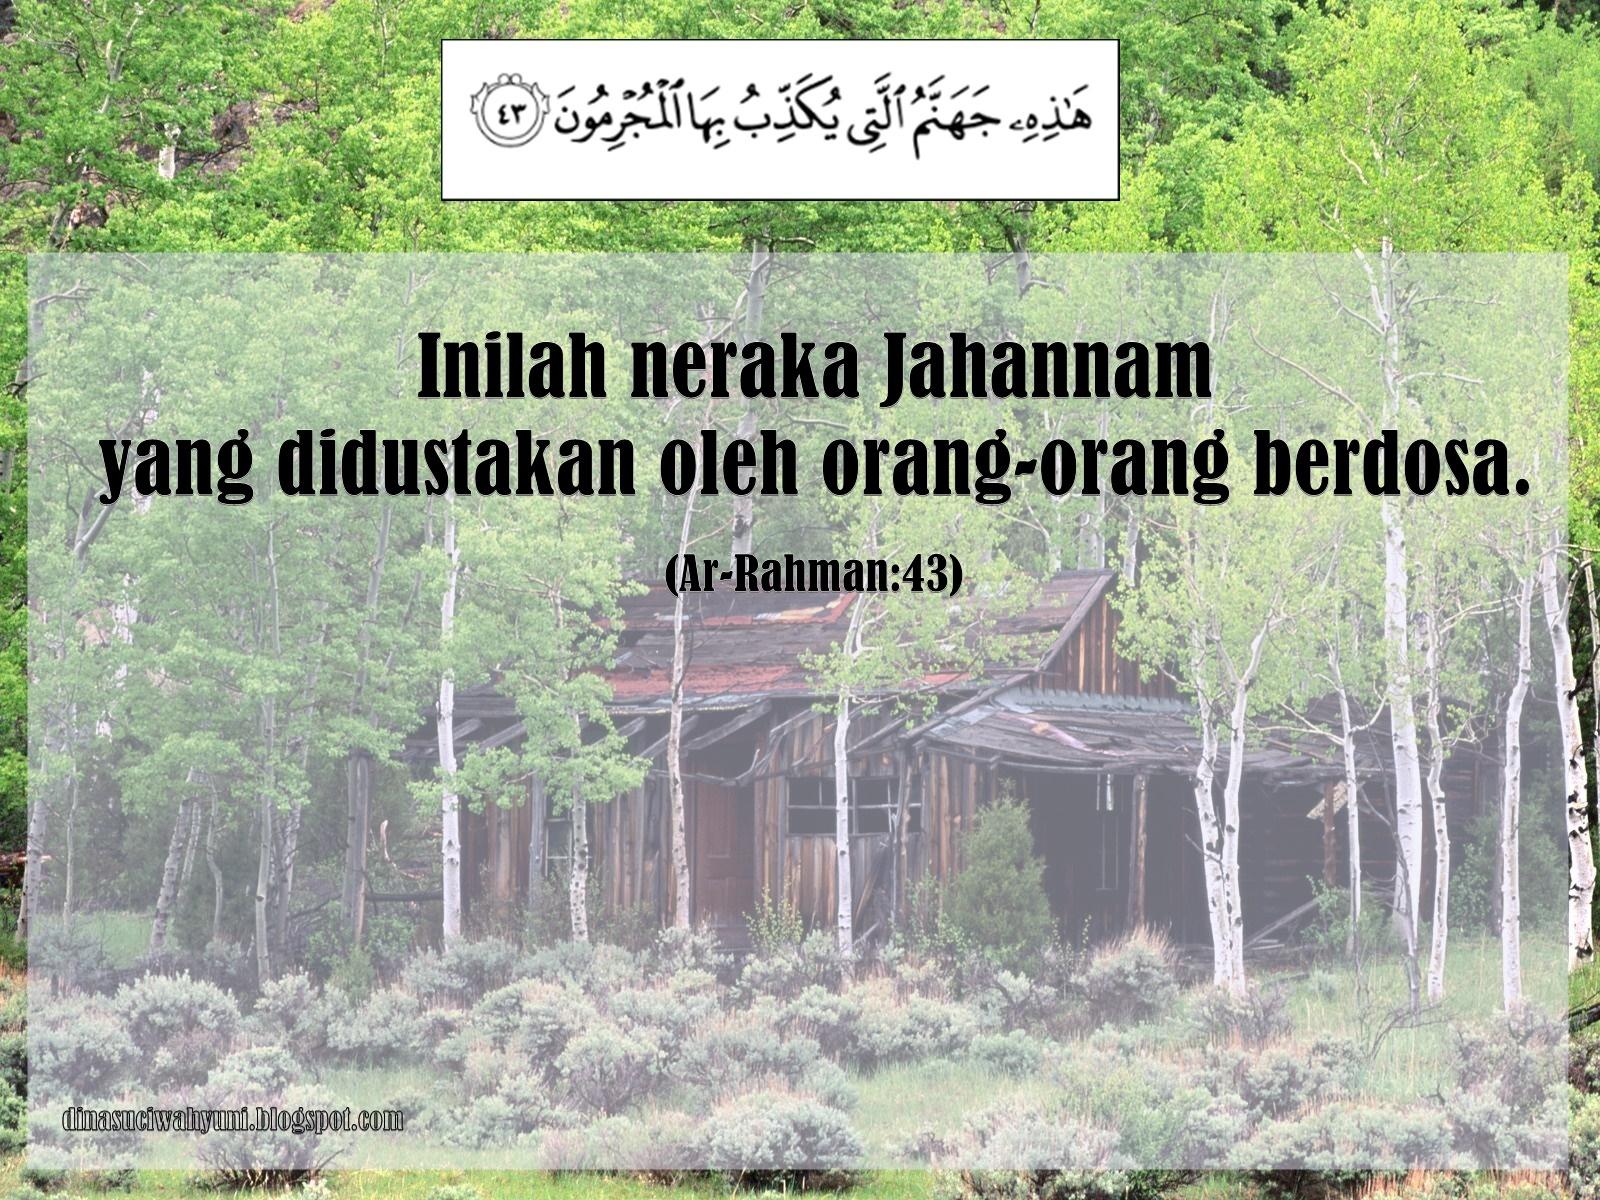 Surat Ar Rahman Yang Maha Pemurah Dan Terjemahannya Dalam Bahasa Indonesia Jdsk